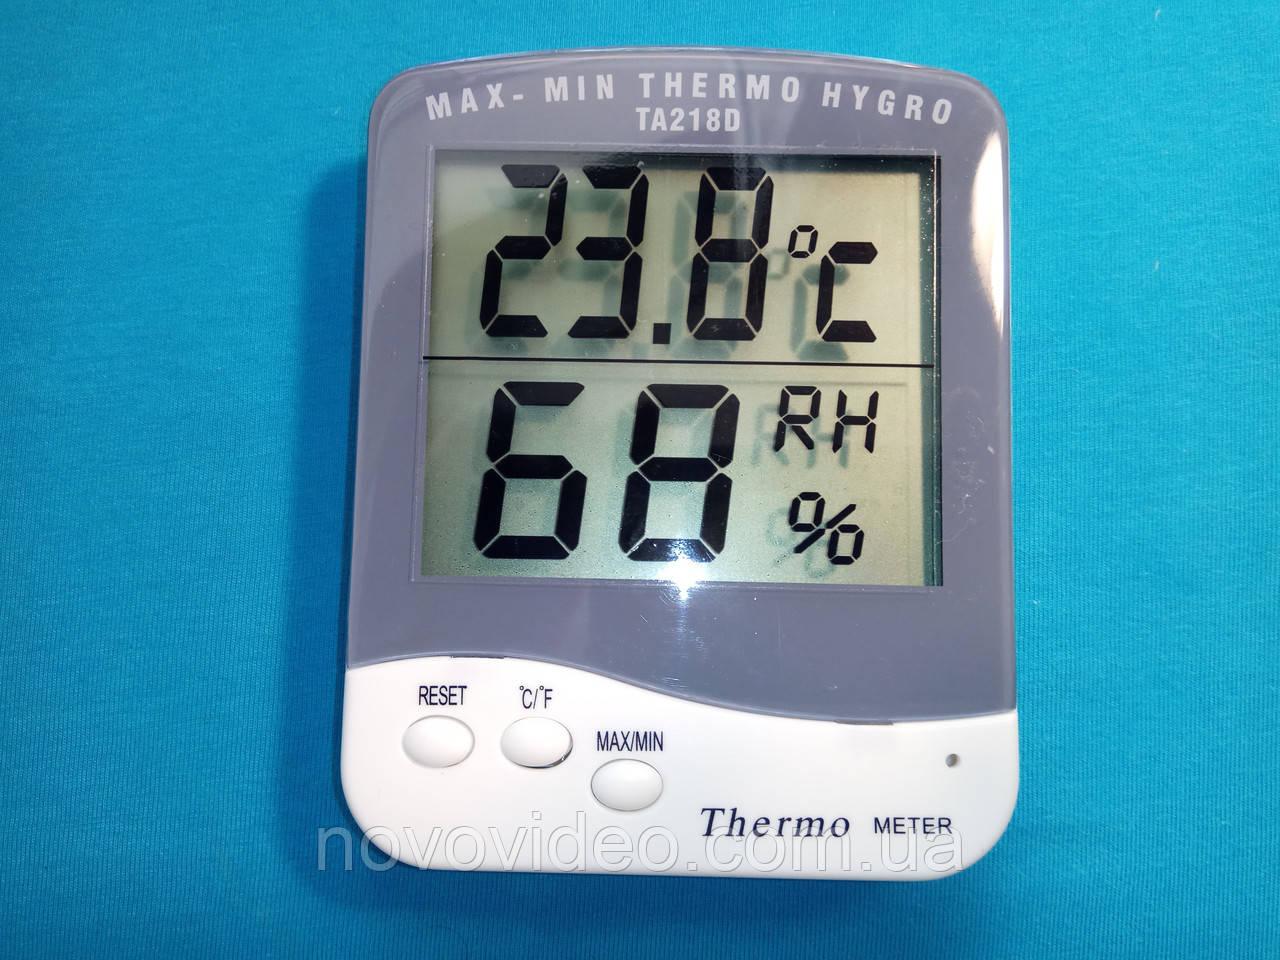 Гигрометр с термометром ТА 218d для помещения